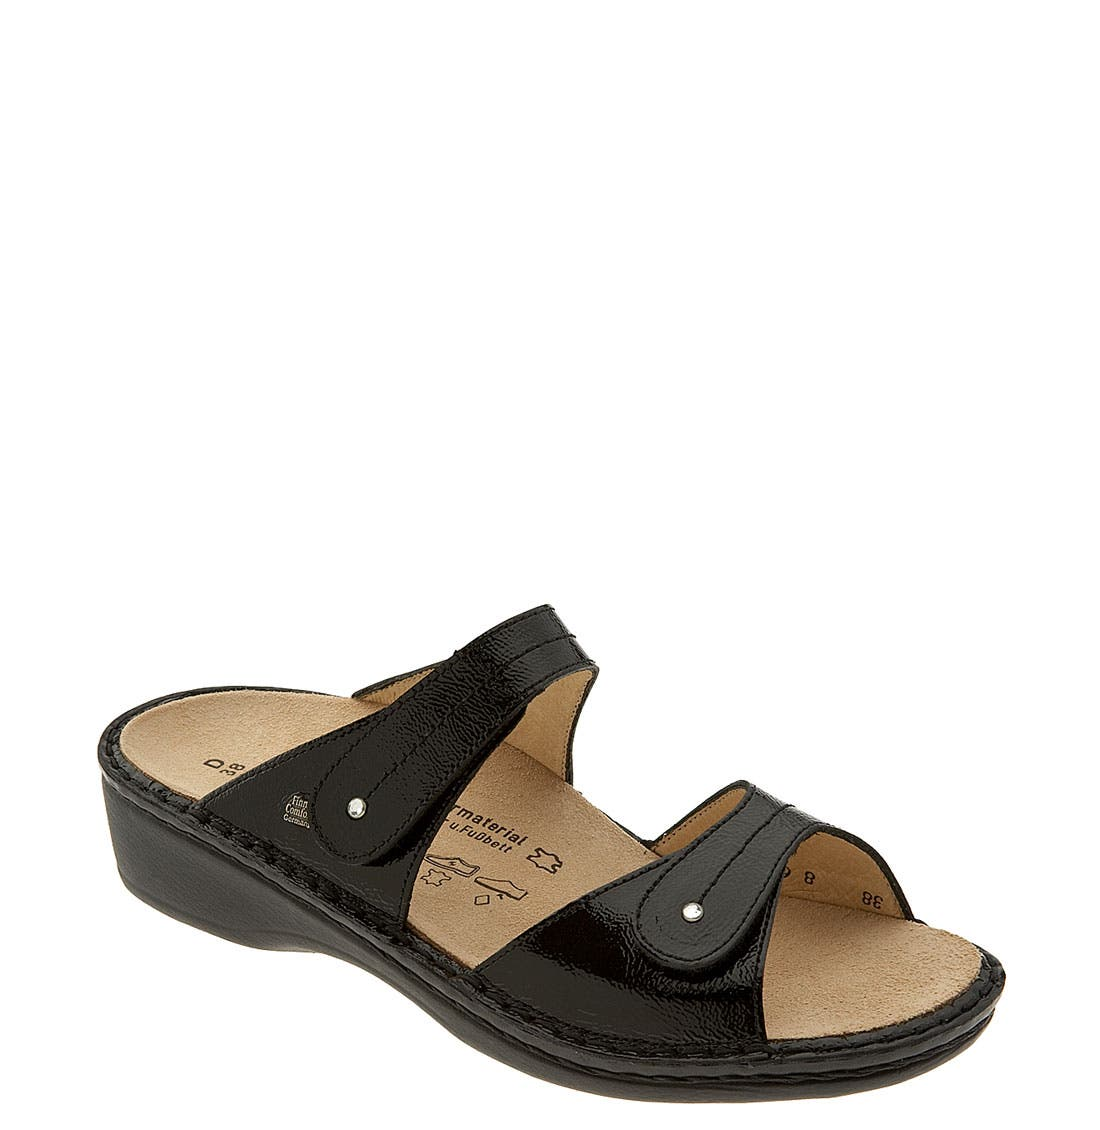 'Catalina' Sandal, Main, color, 001